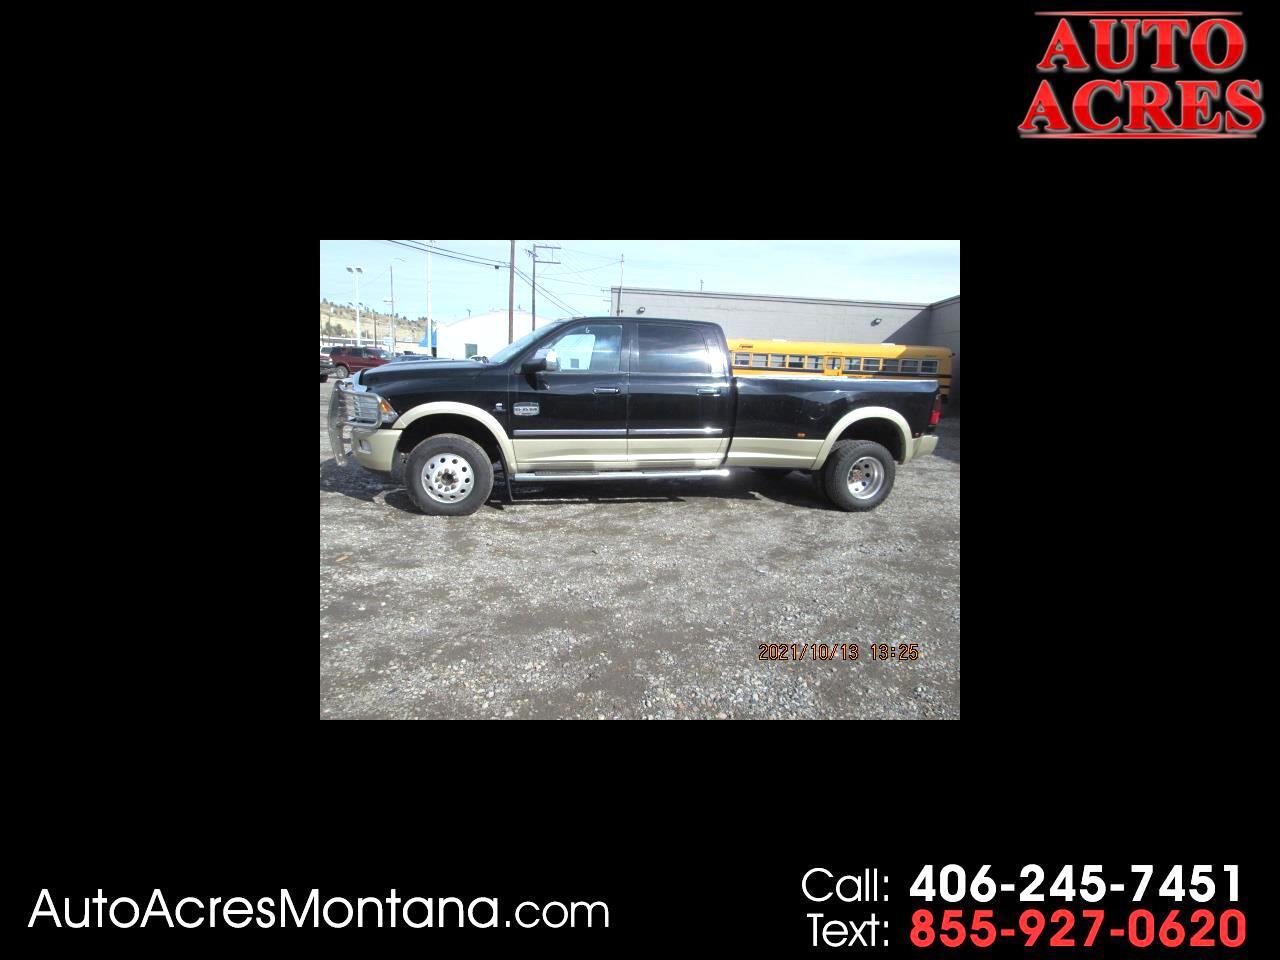 "RAM 3500 4WD Crew Cab 169"" Laramie Longhorn 2012"